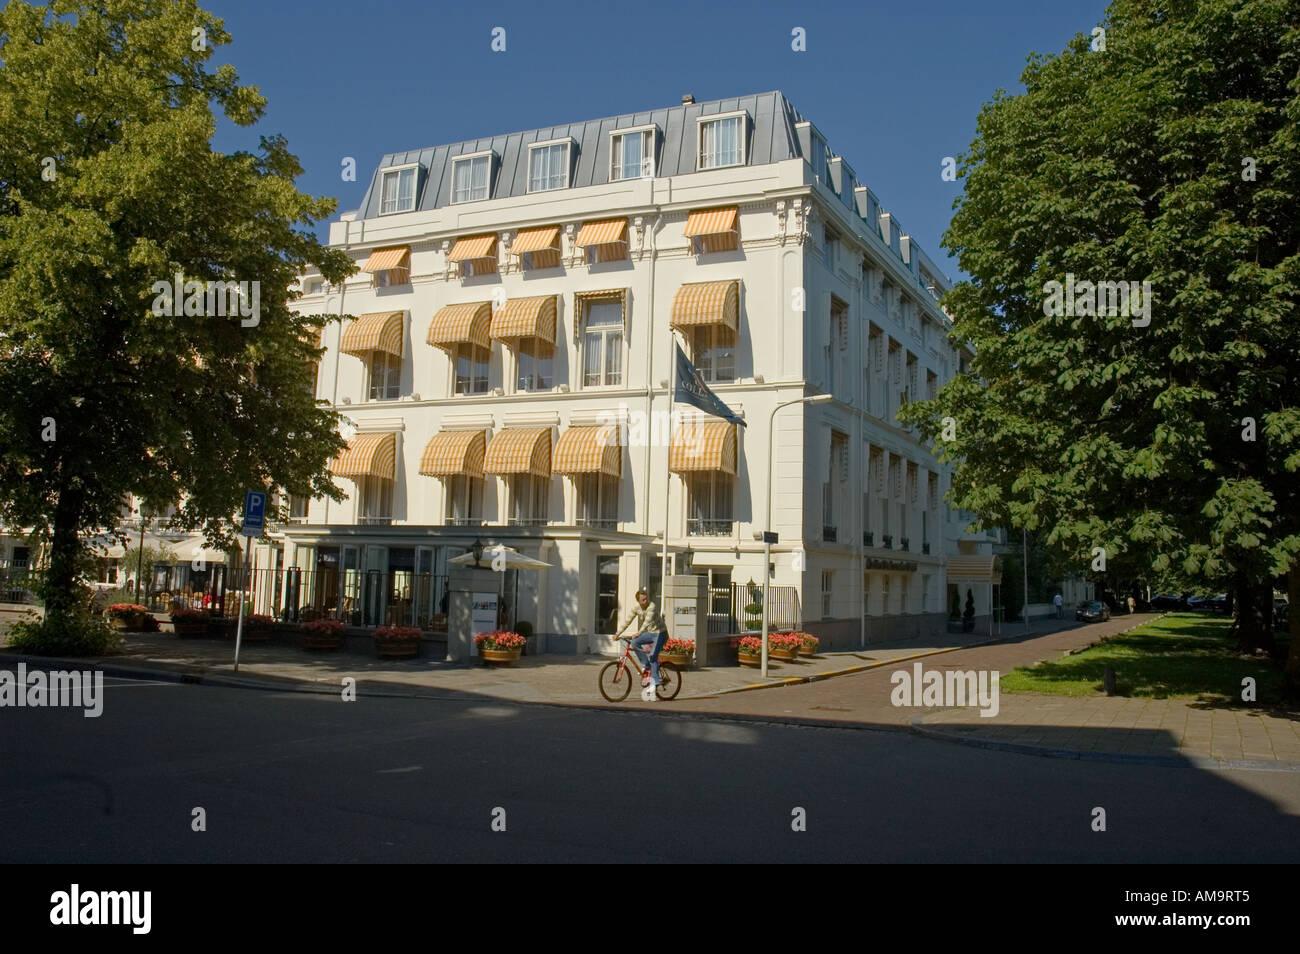 Carlton Ambassador Hotel, Den Haag, Netherlands - Stock Image